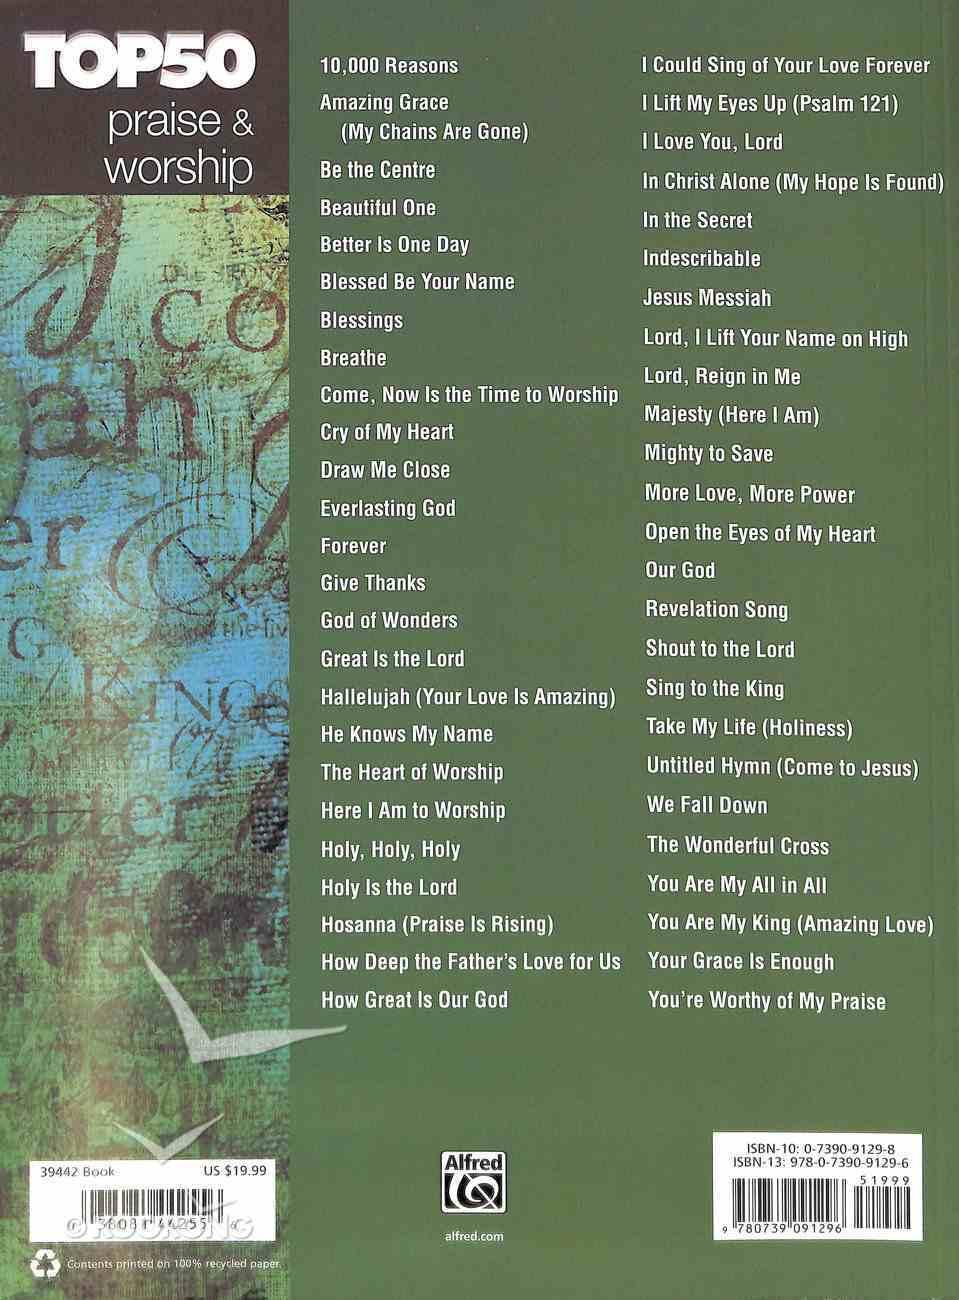 Top 50 Praise & Worship: Easy Piano (Music Book) Paperback